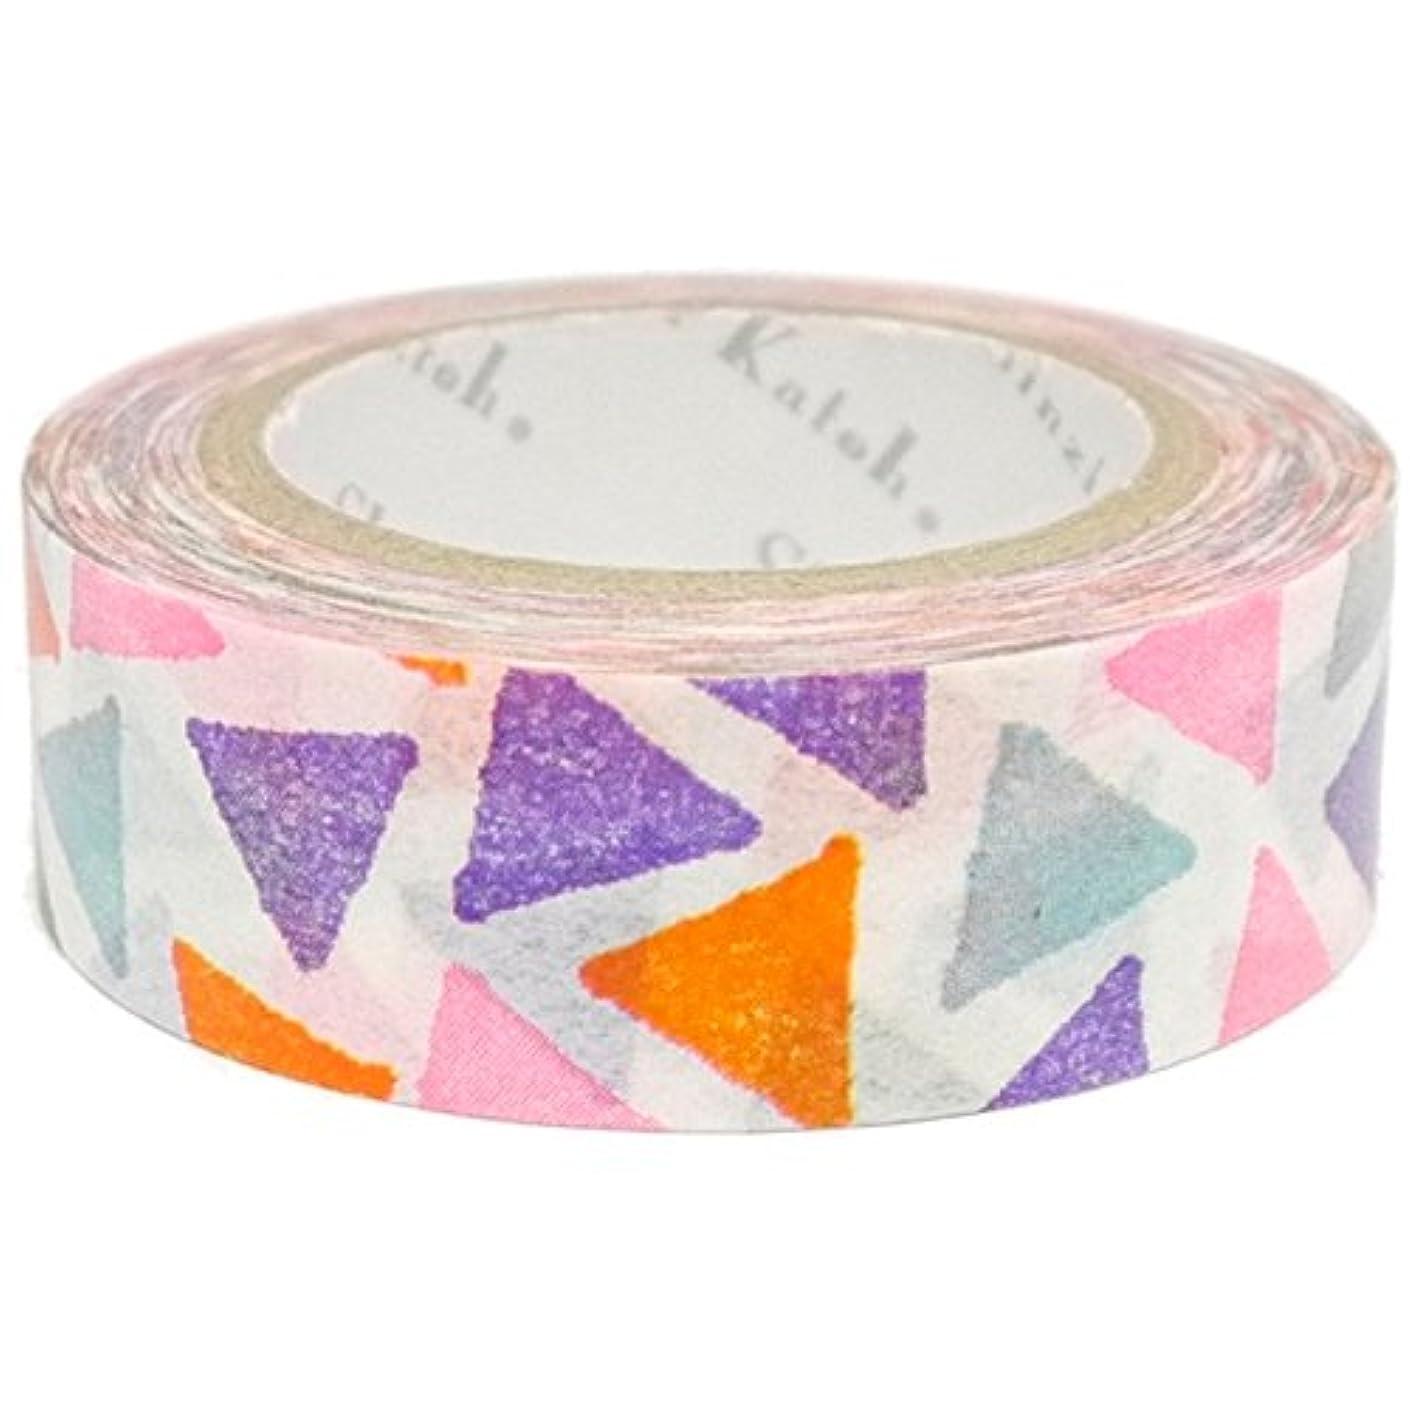 SEAL-DO Iroha-Washi Masking Tape, Triangles (ks-wt-10013)